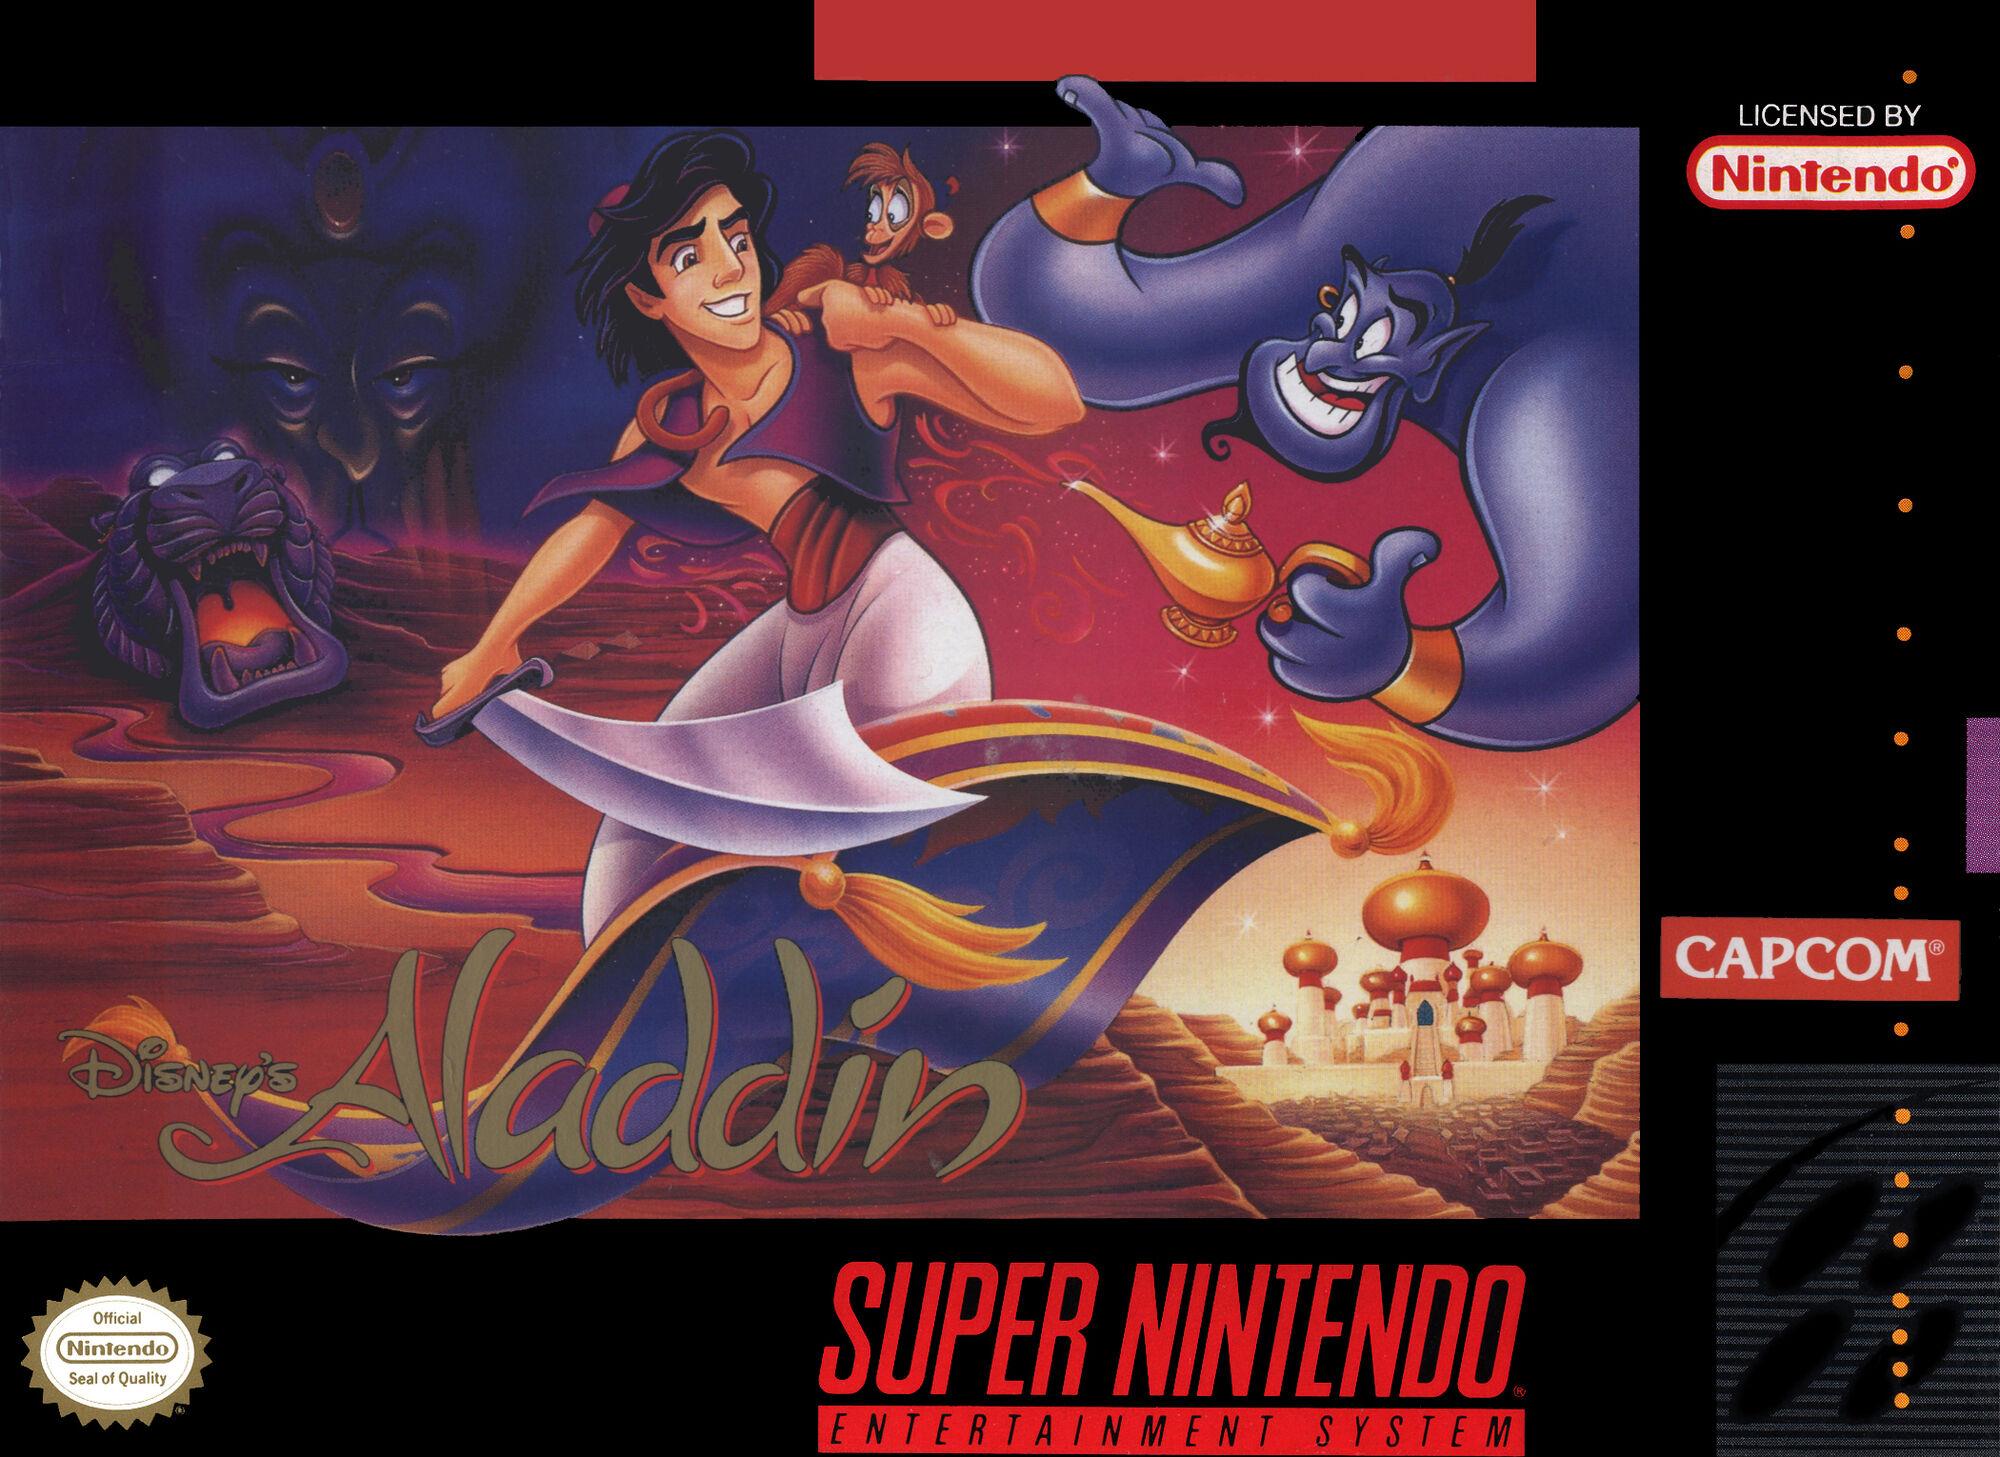 Алладин (Aladdins Legacy)